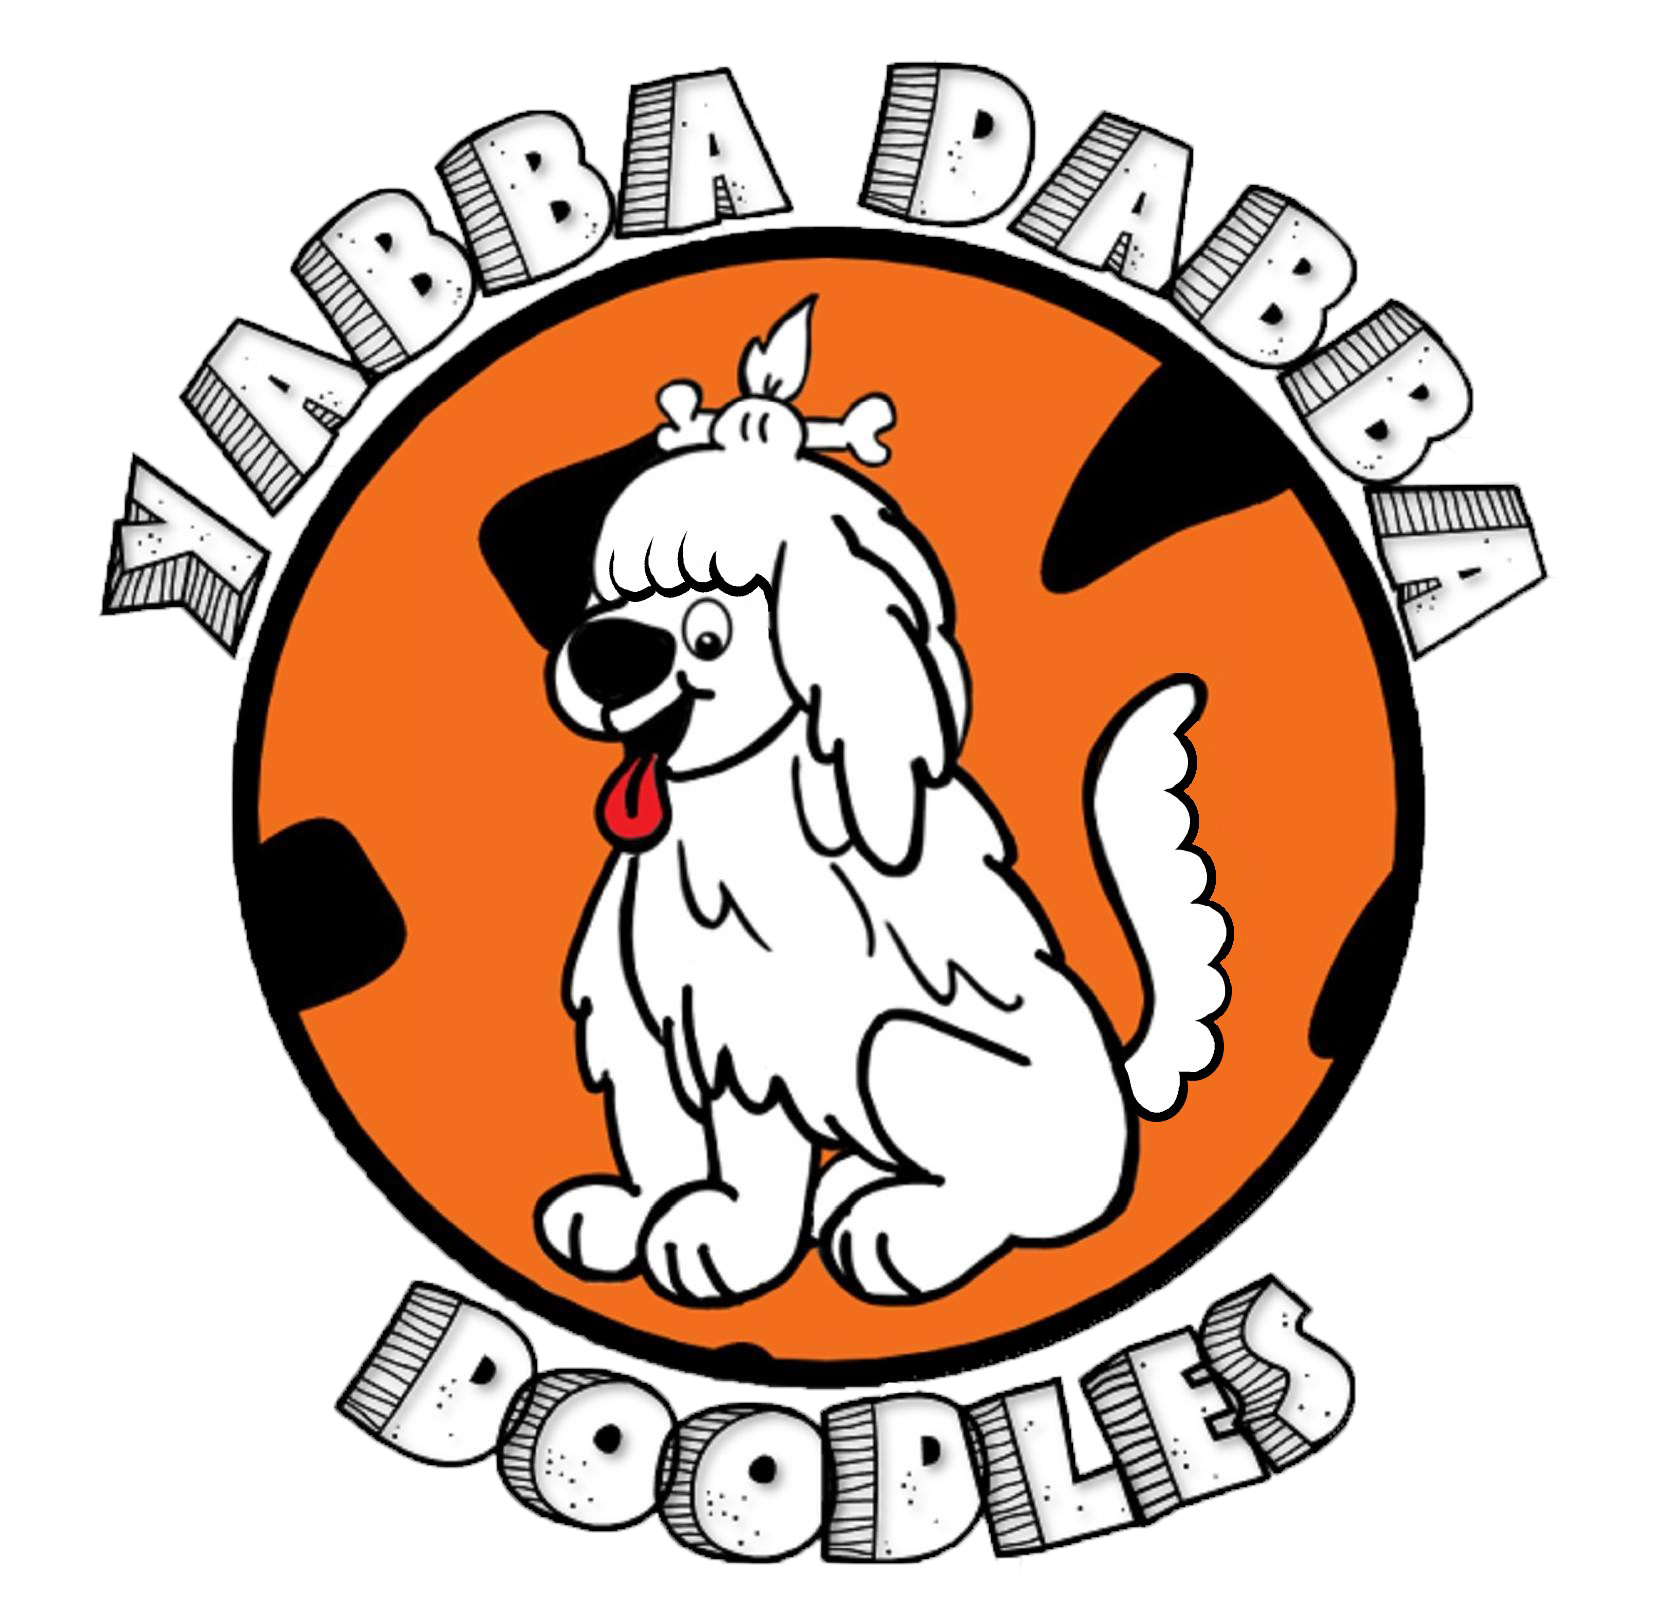 YABBA DABBA DOODLES